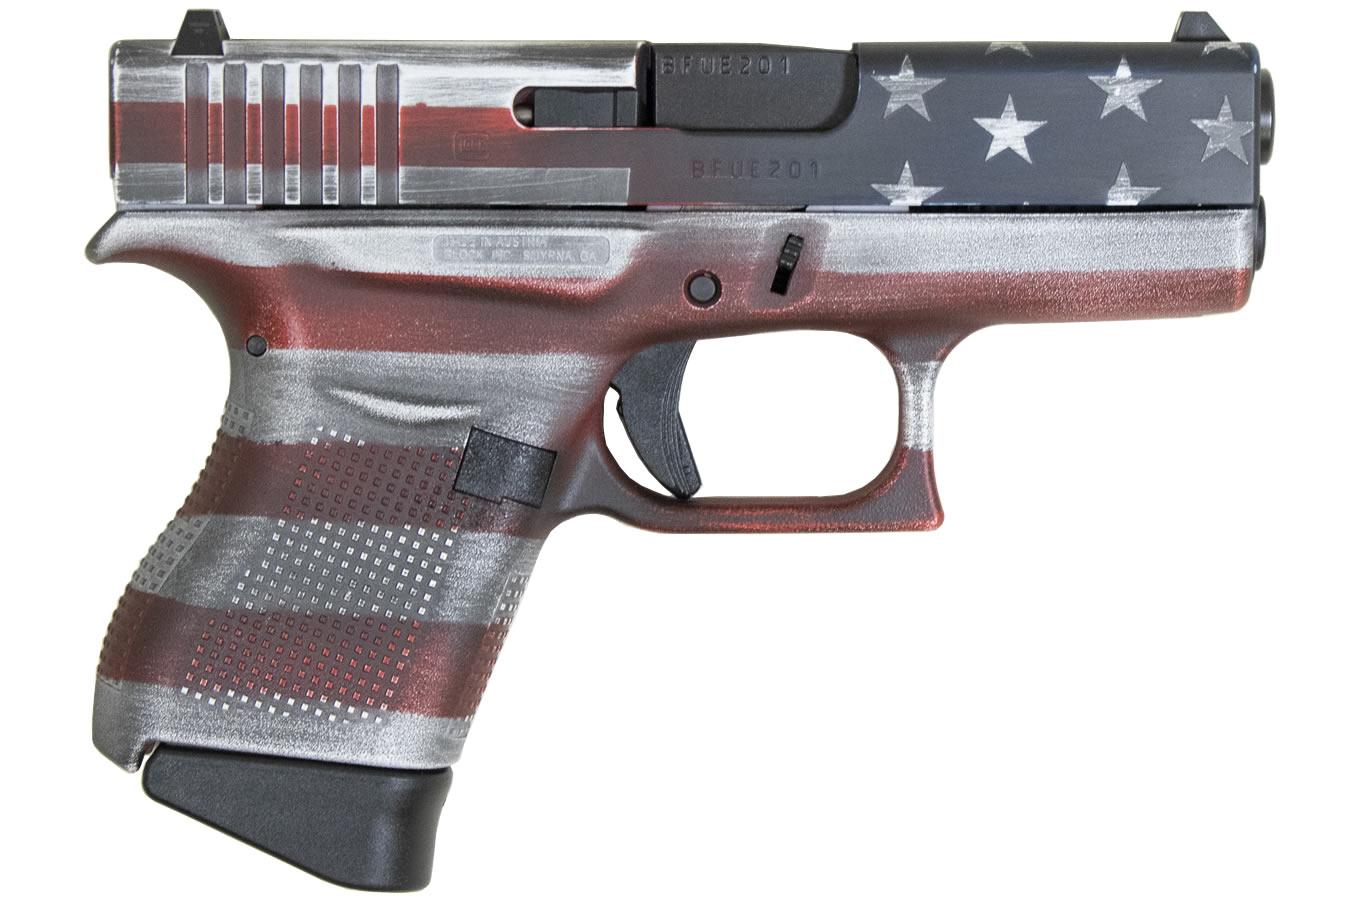 Glock 43 9mm Single Stack Pistol with Cerakote Battleworn ...